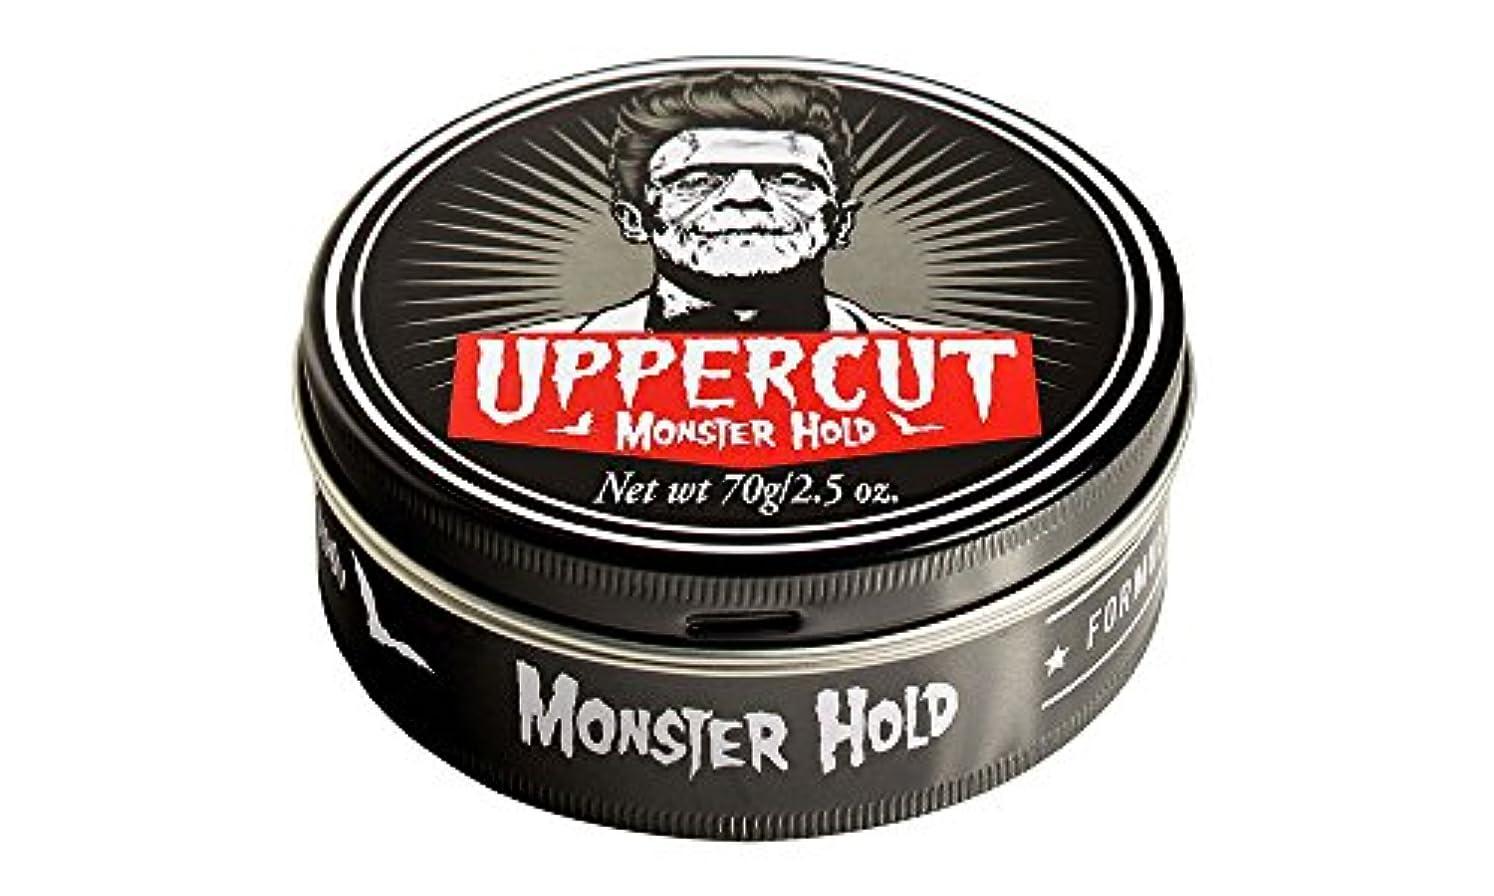 UPPERCUT DELUXE(アッパーカットデラックス) MONSTER HOLD 油性ポマード 70g